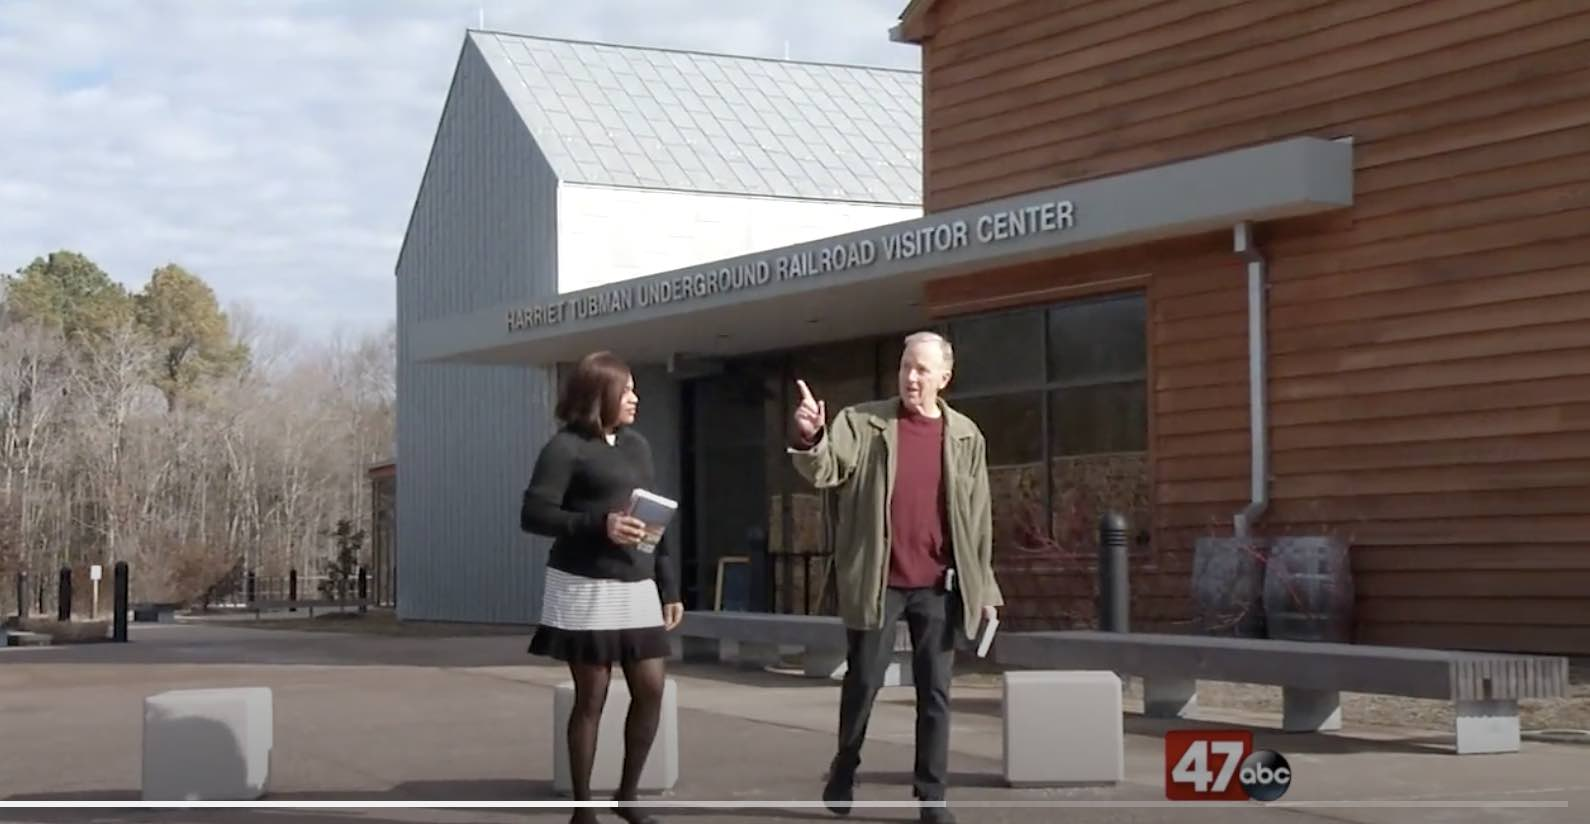 Secrets of the Eastern Shore featured on WMDT-TV News Segment on Harriet Tubman